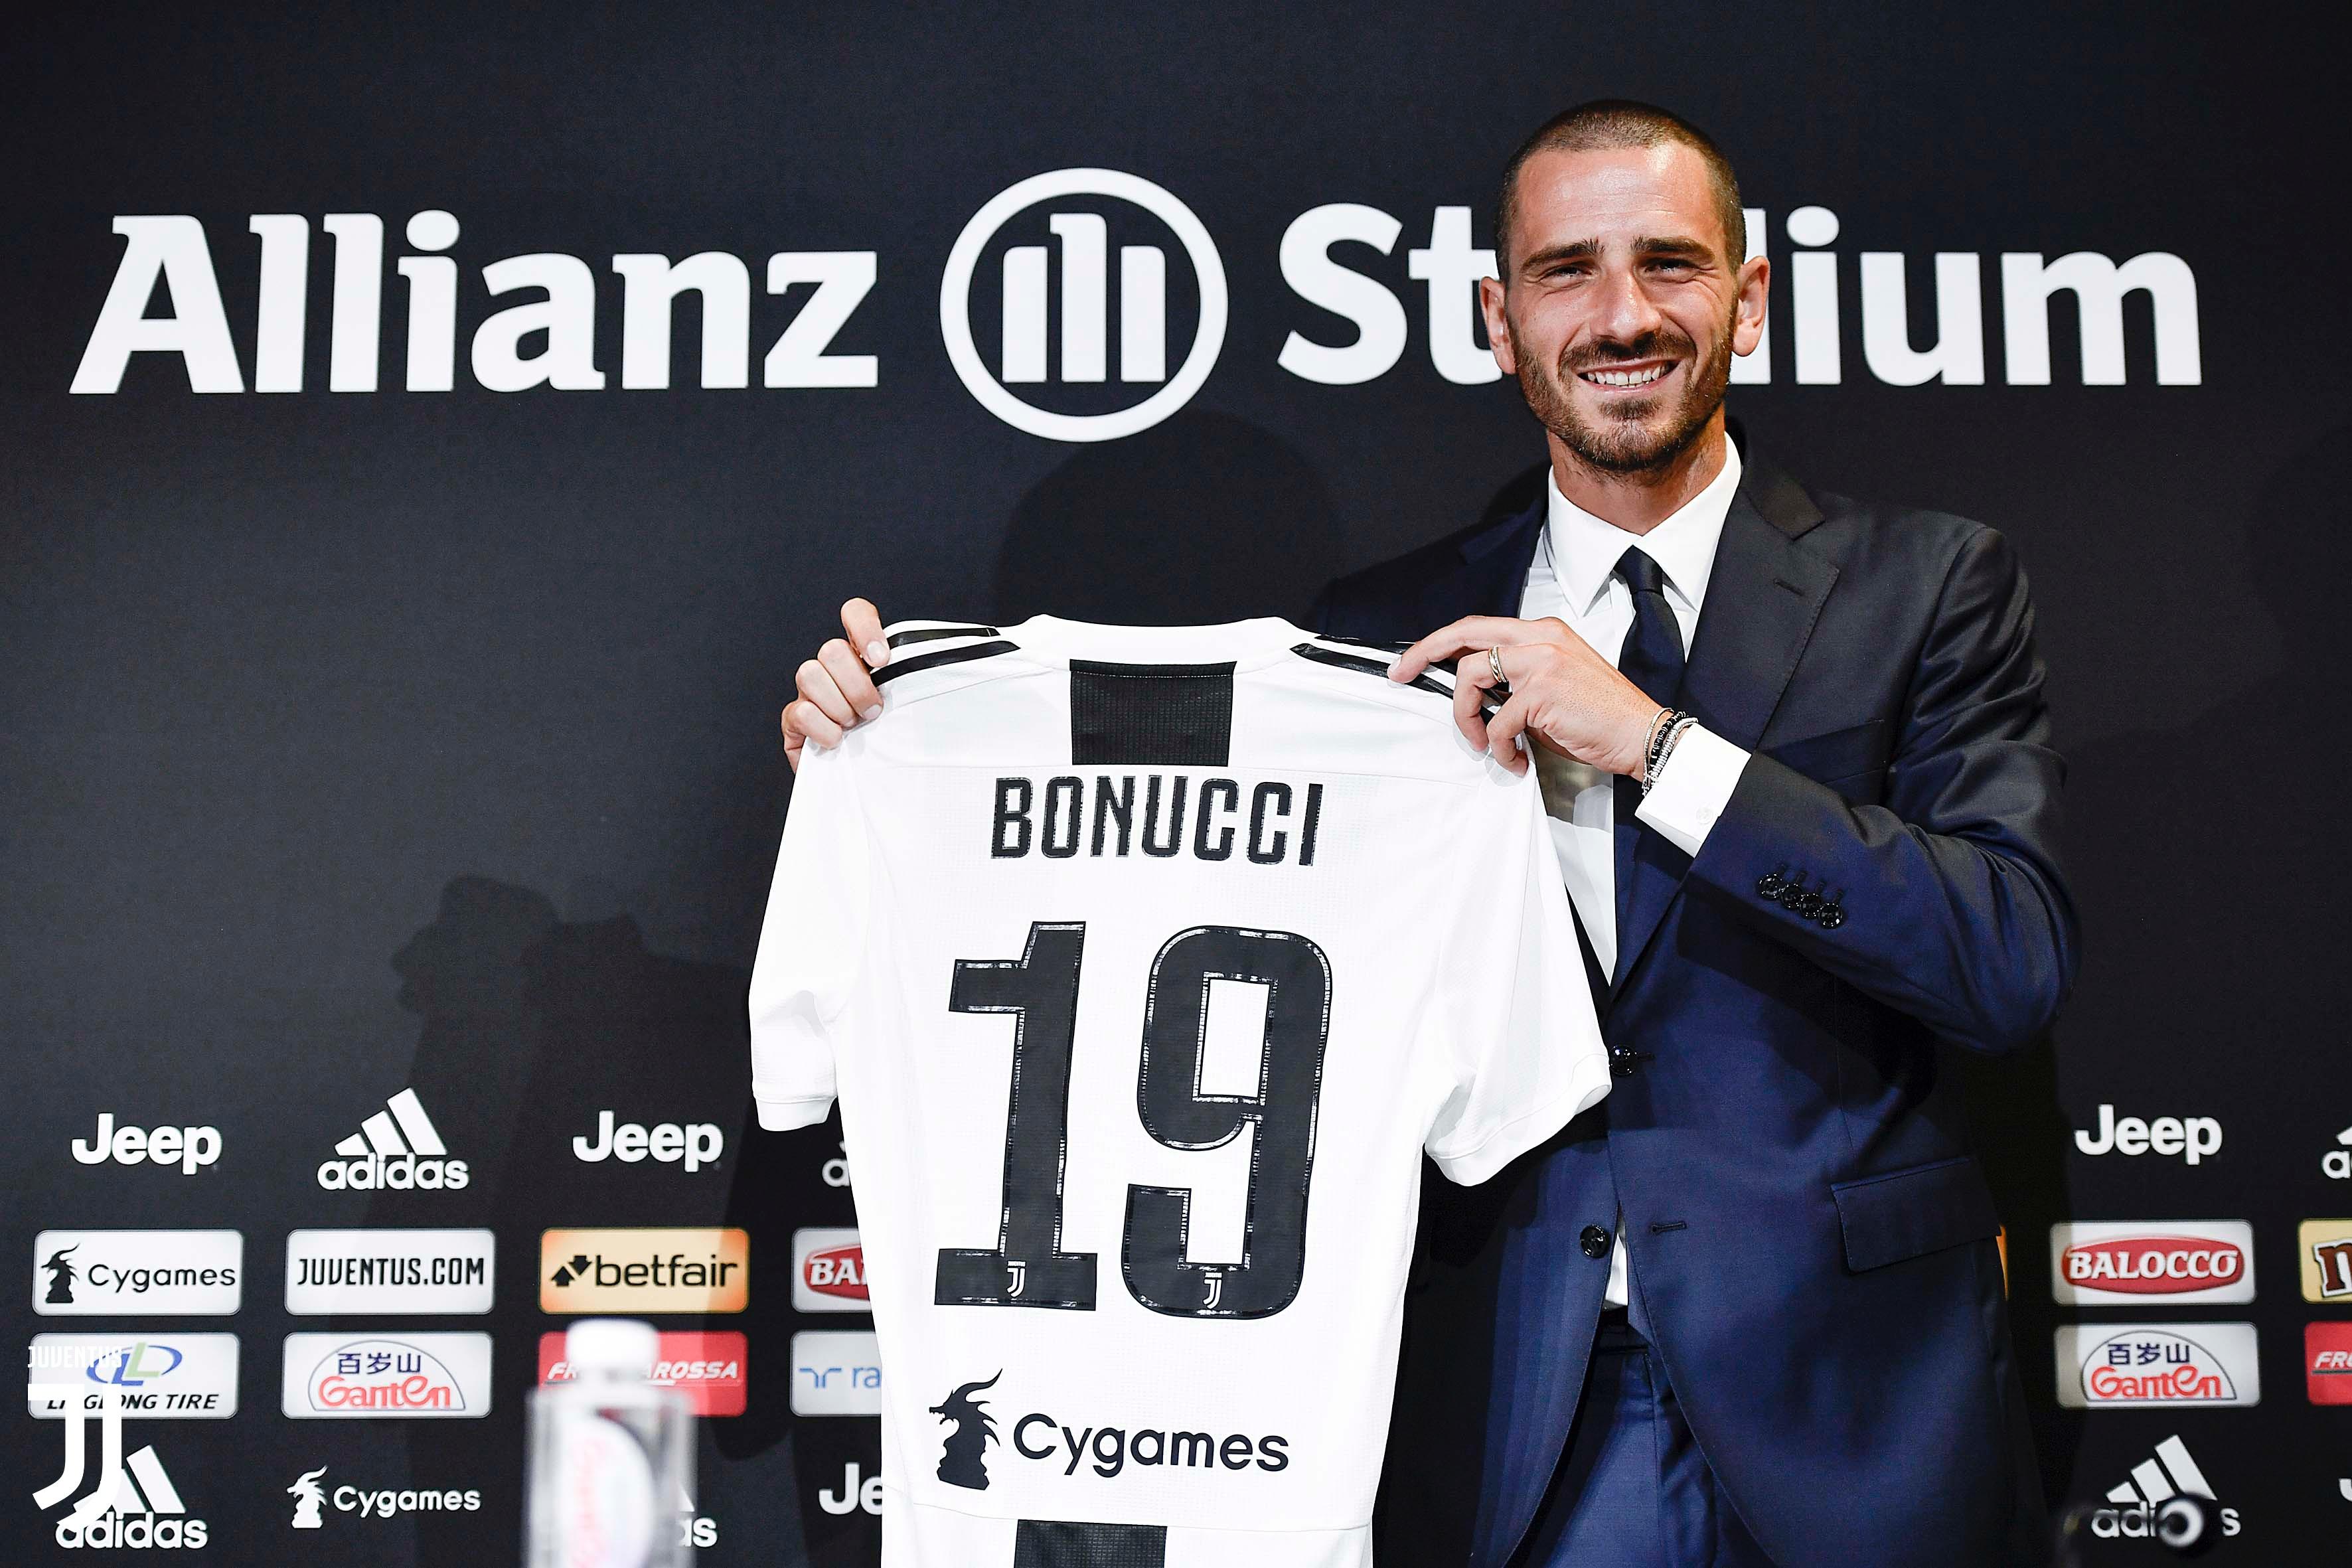 CALCIO Juventus, bentornato Bonucci